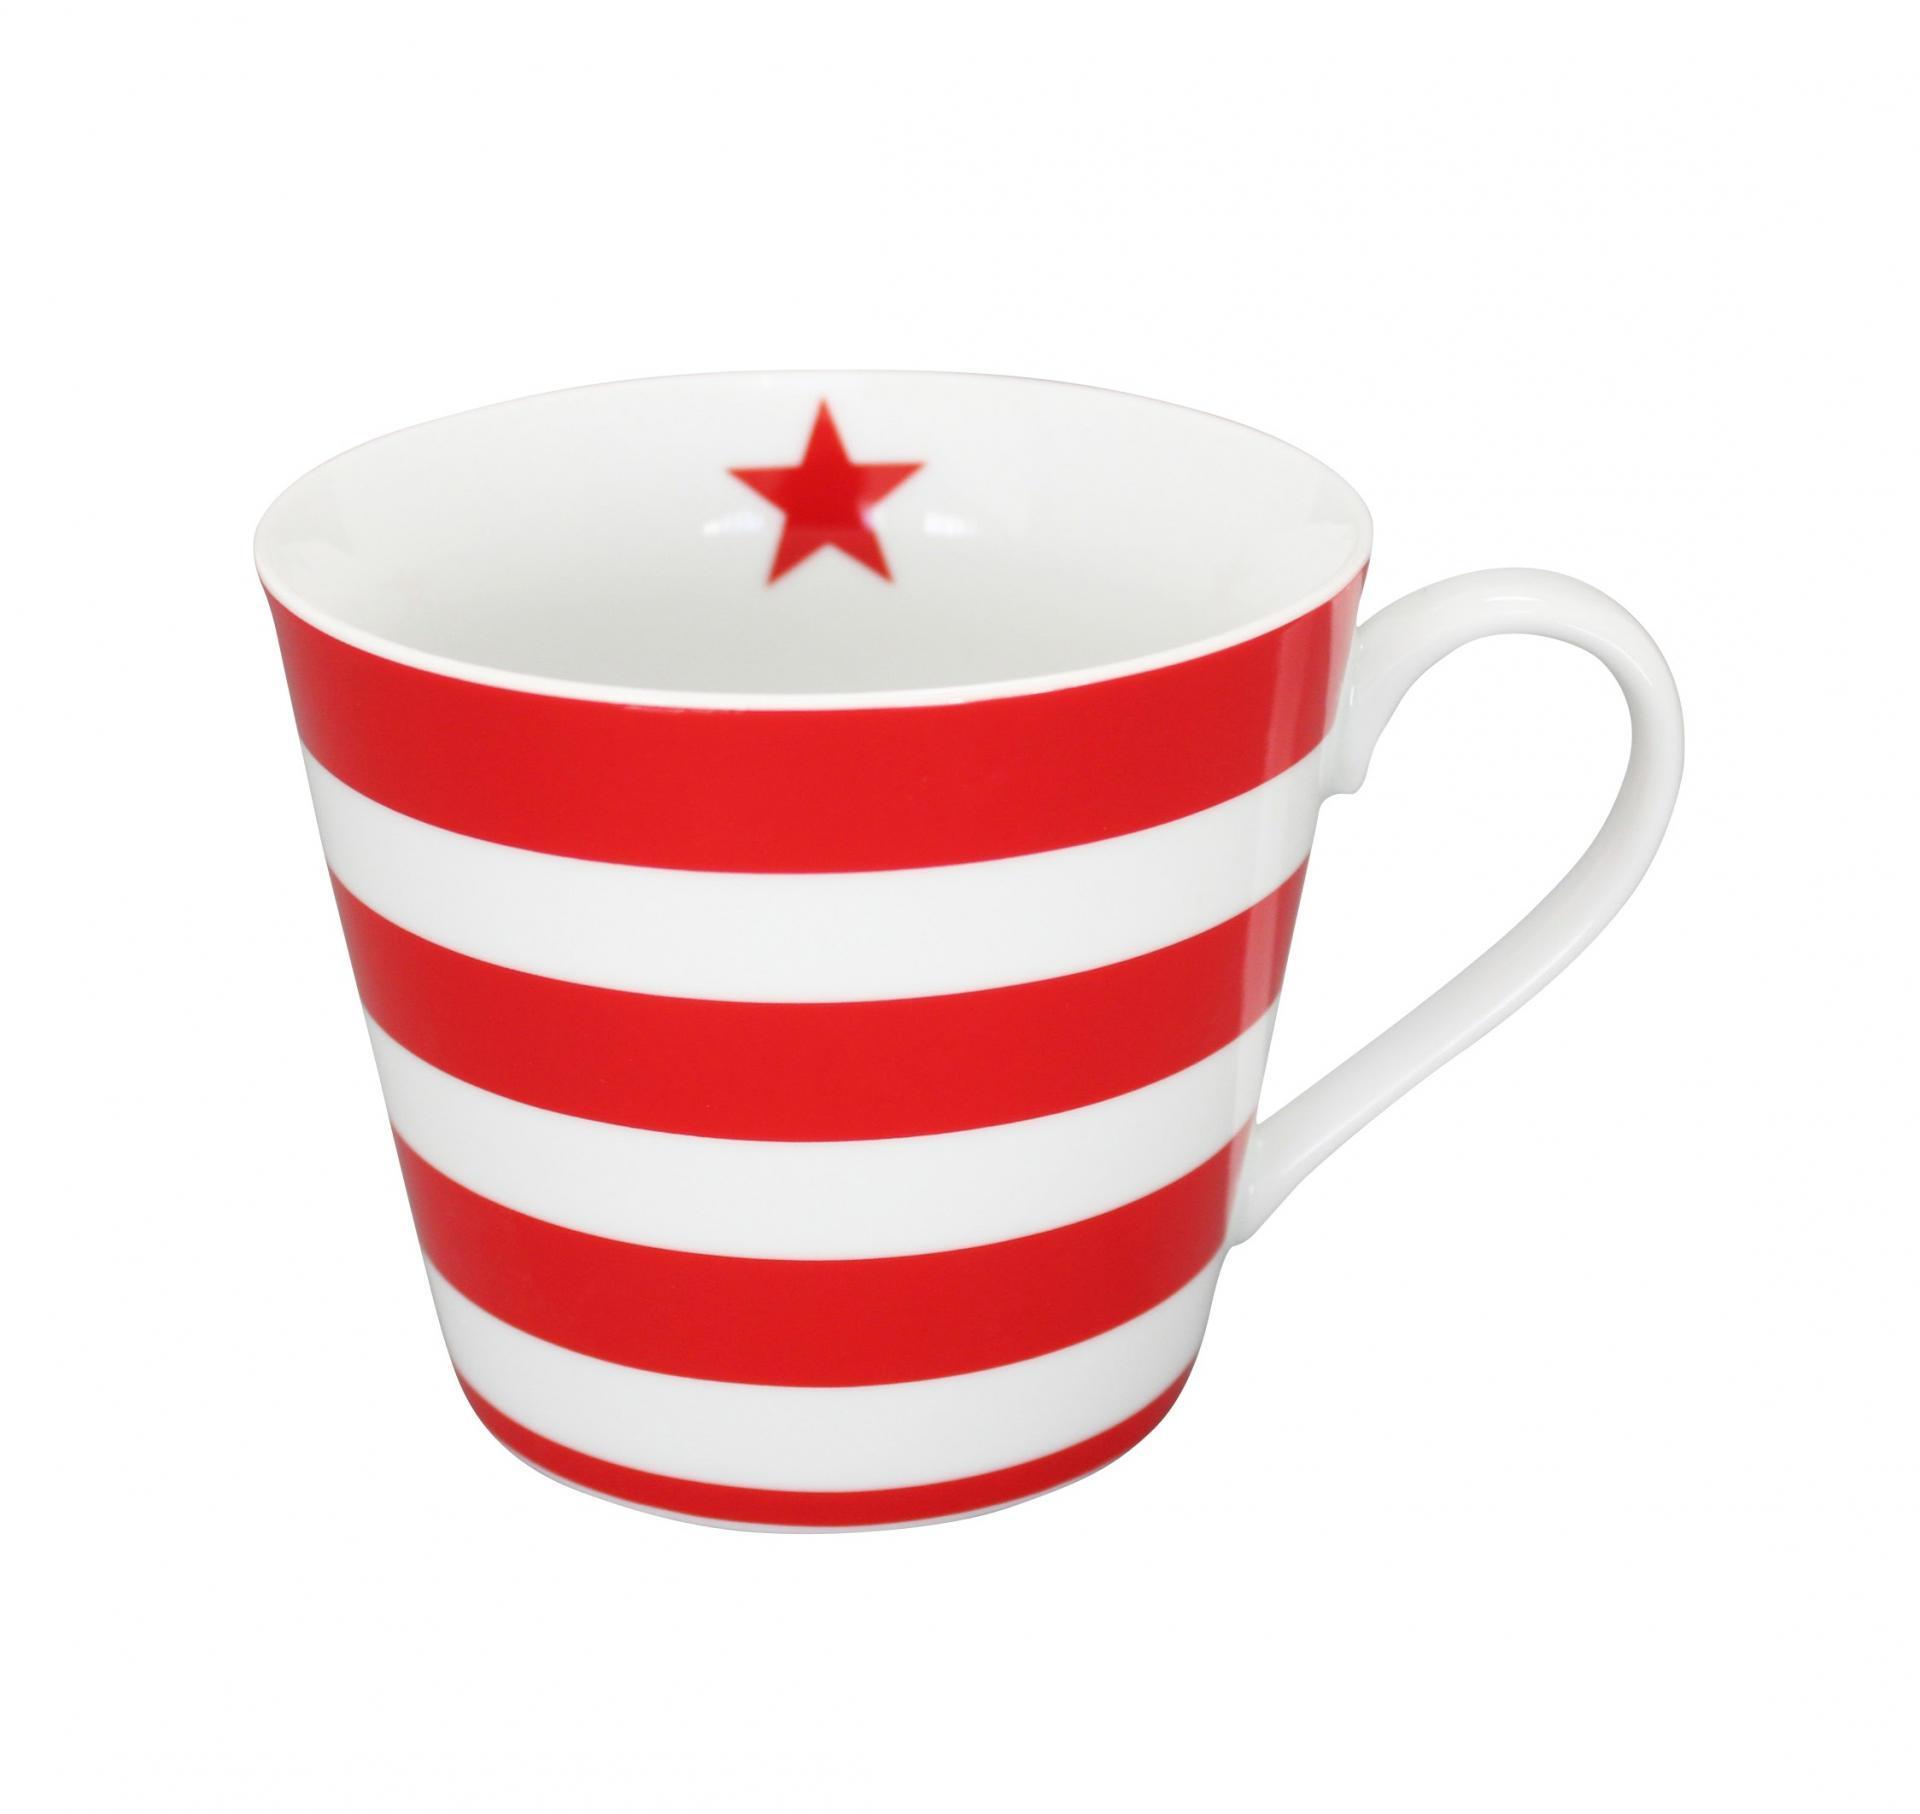 Krasilnikoff Hrneček Stripes red, červená barva, porcelán